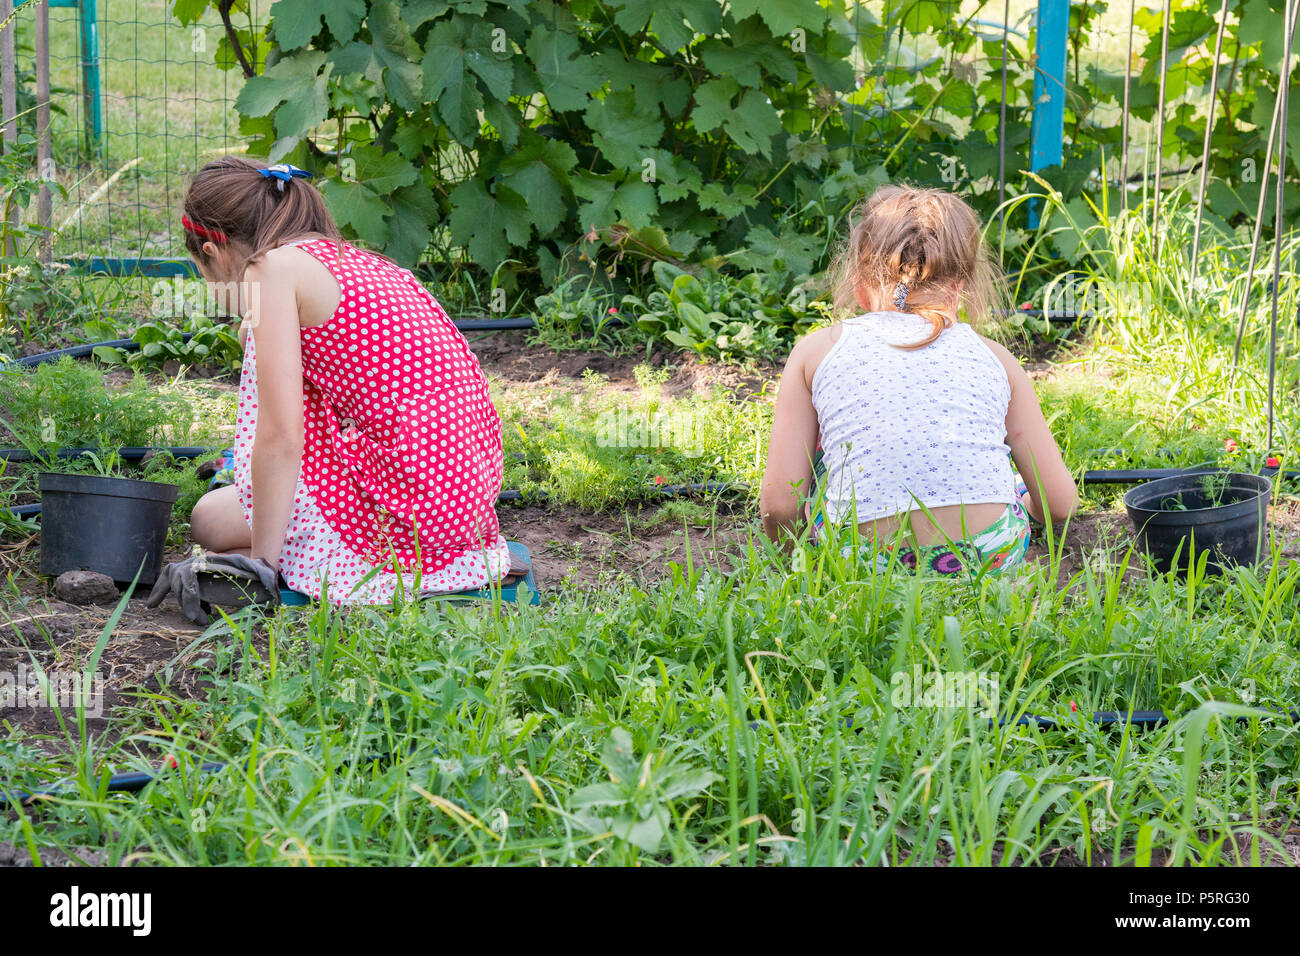 Closeup image of two teenage girls weeding garden bed. Female Gardening Weeding Weed Plants Grass